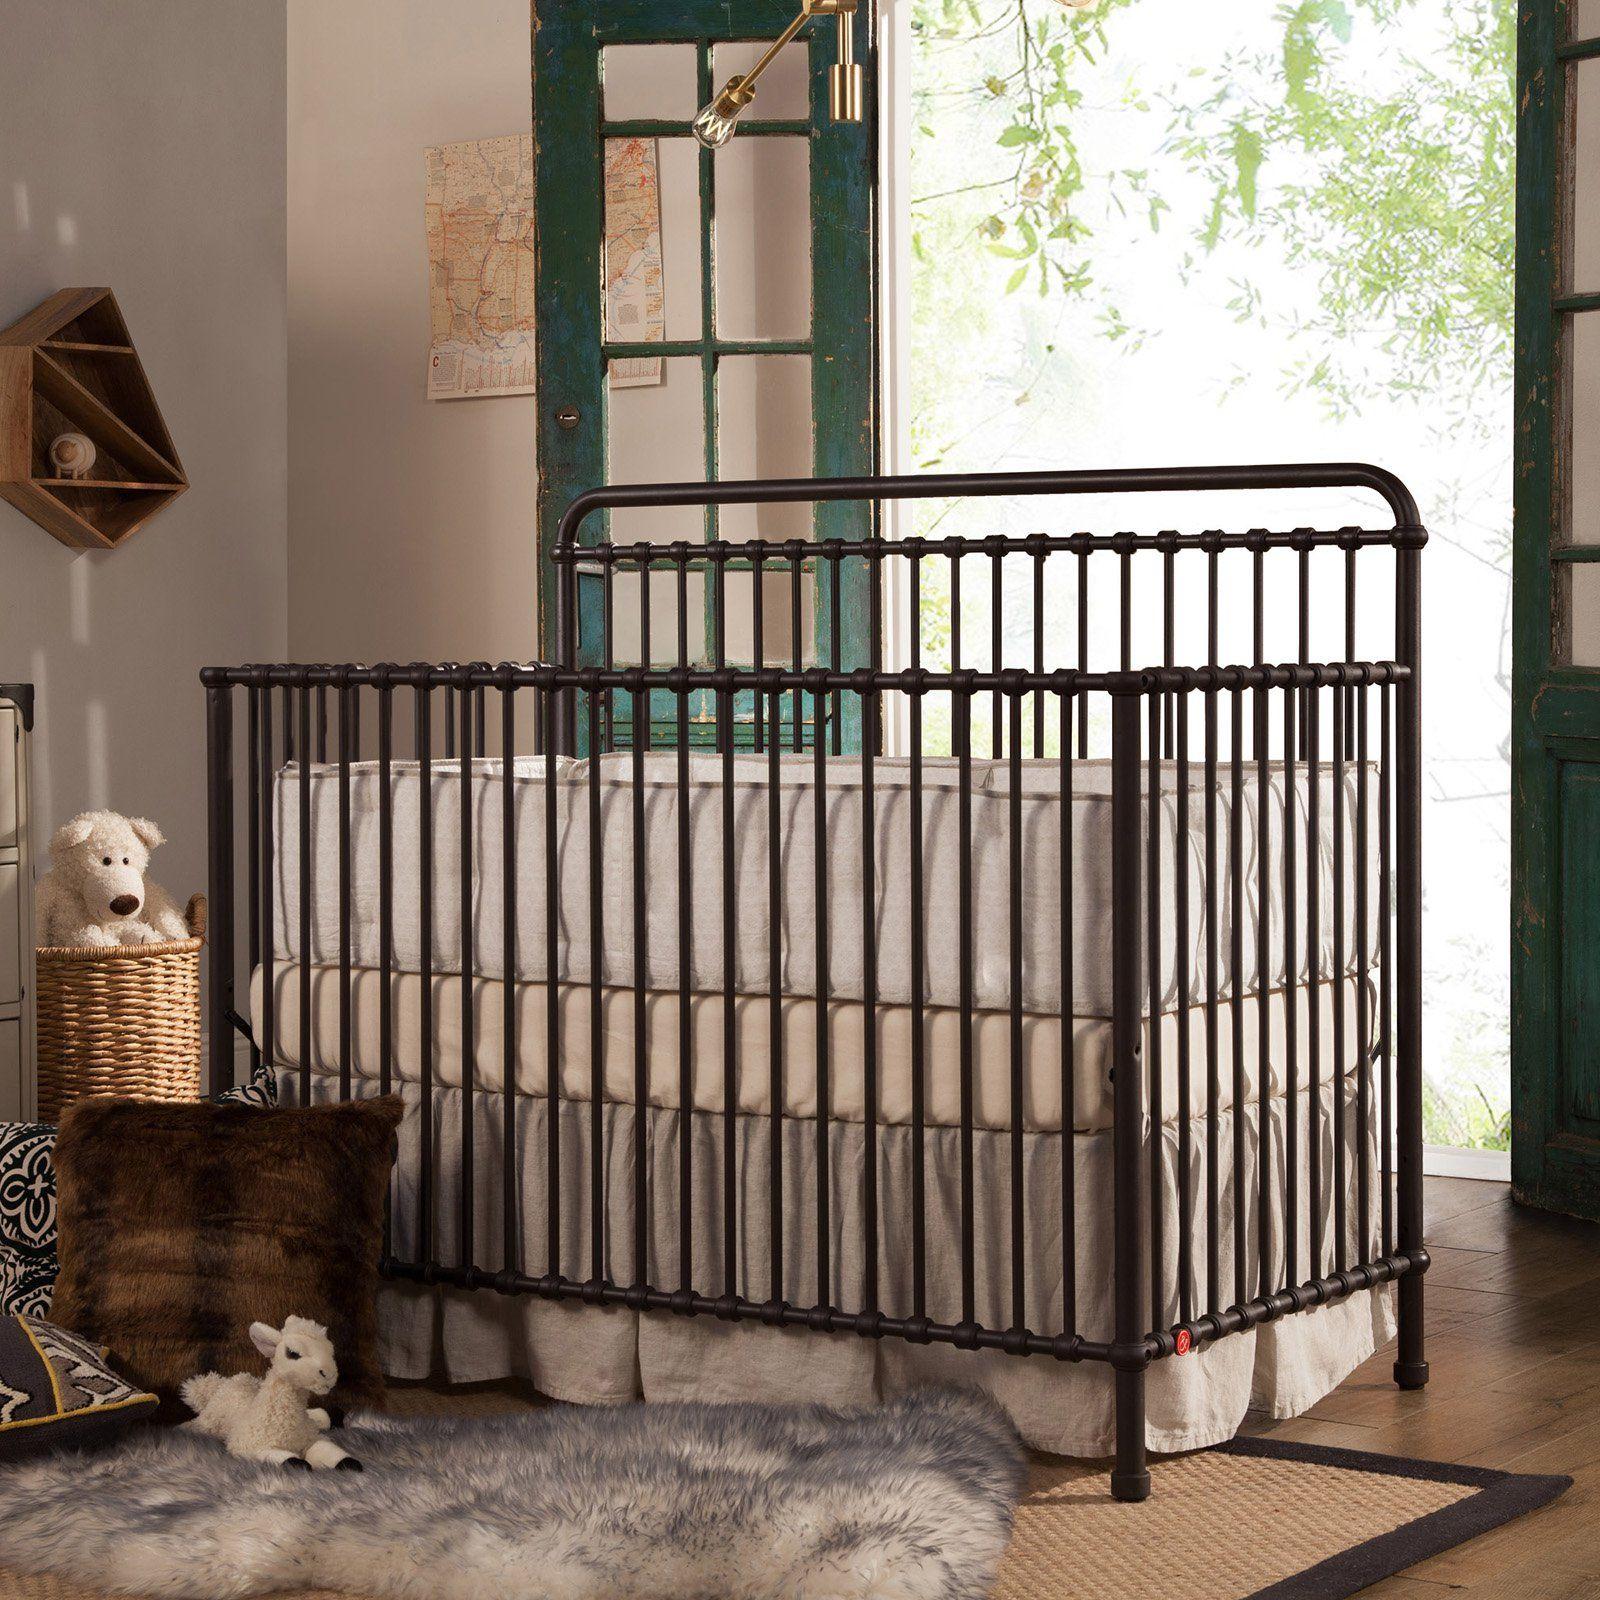 Million Dollar Baby Classic Winston 4-in-1 Convertible Iron Crib ...